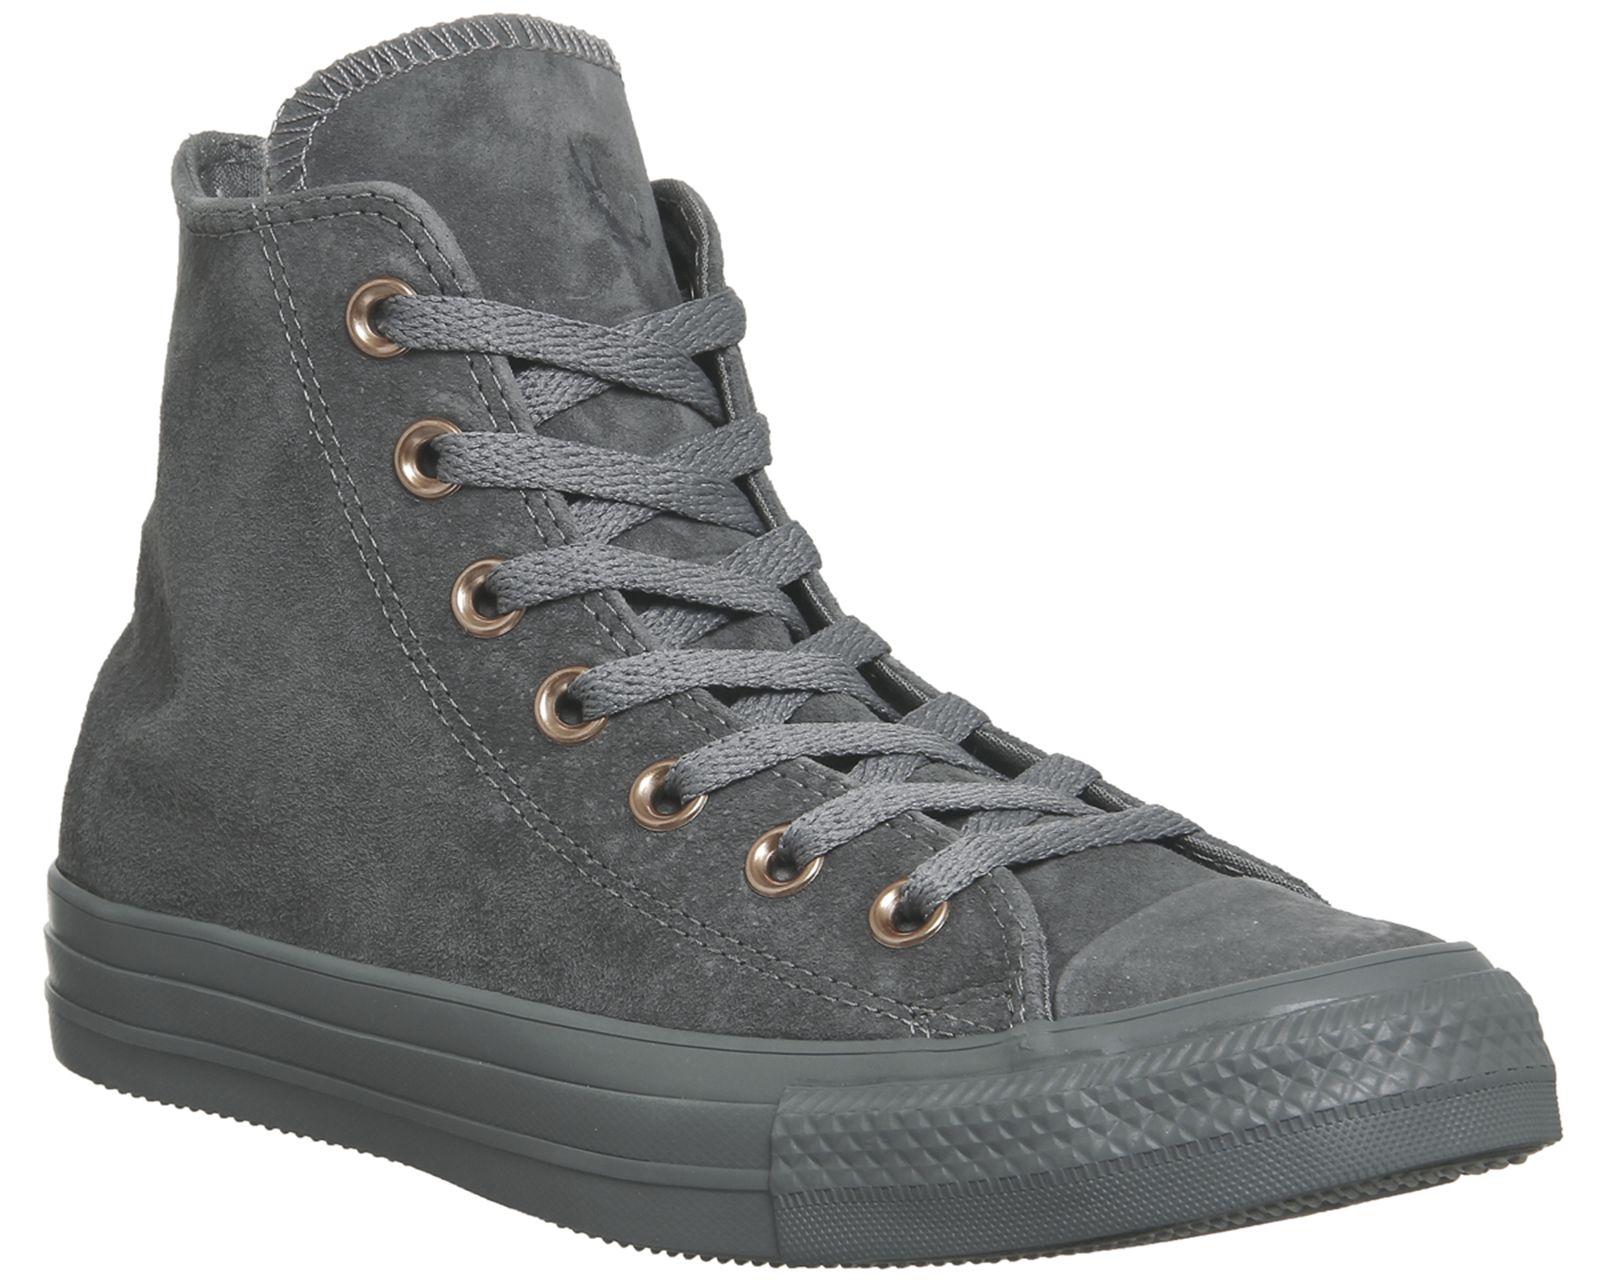 Converse All Star Hi Leather Mason Grey